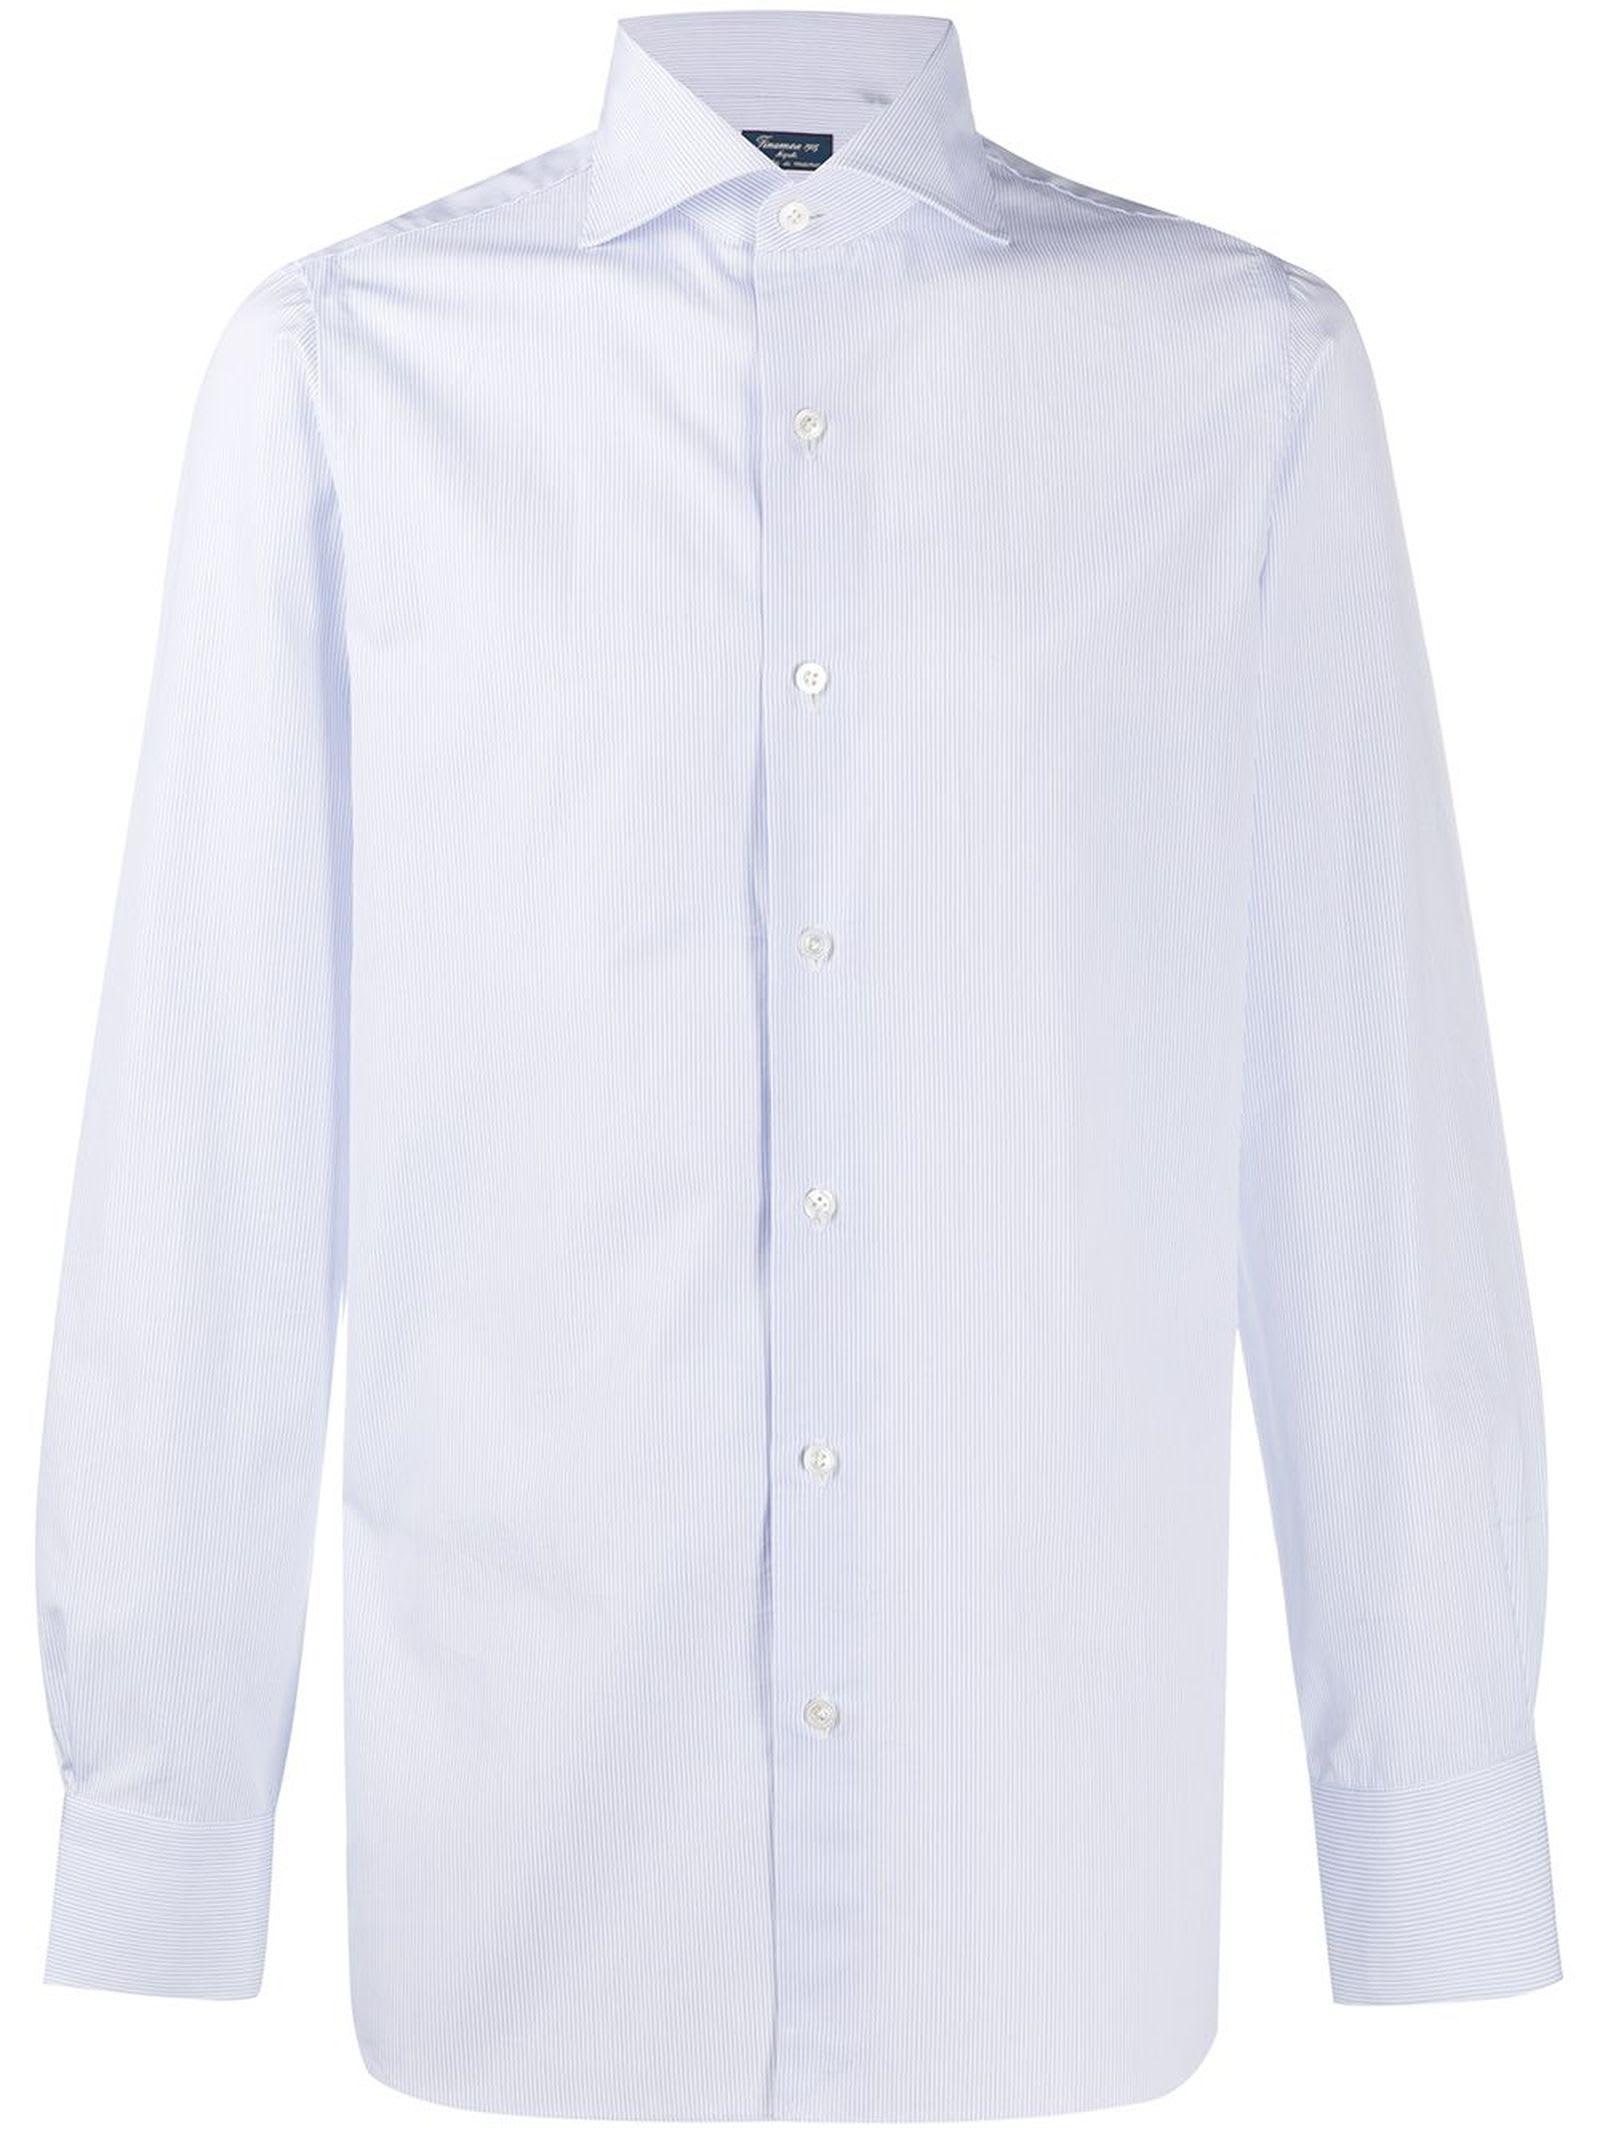 Light Blue Cotton Striped Shirt